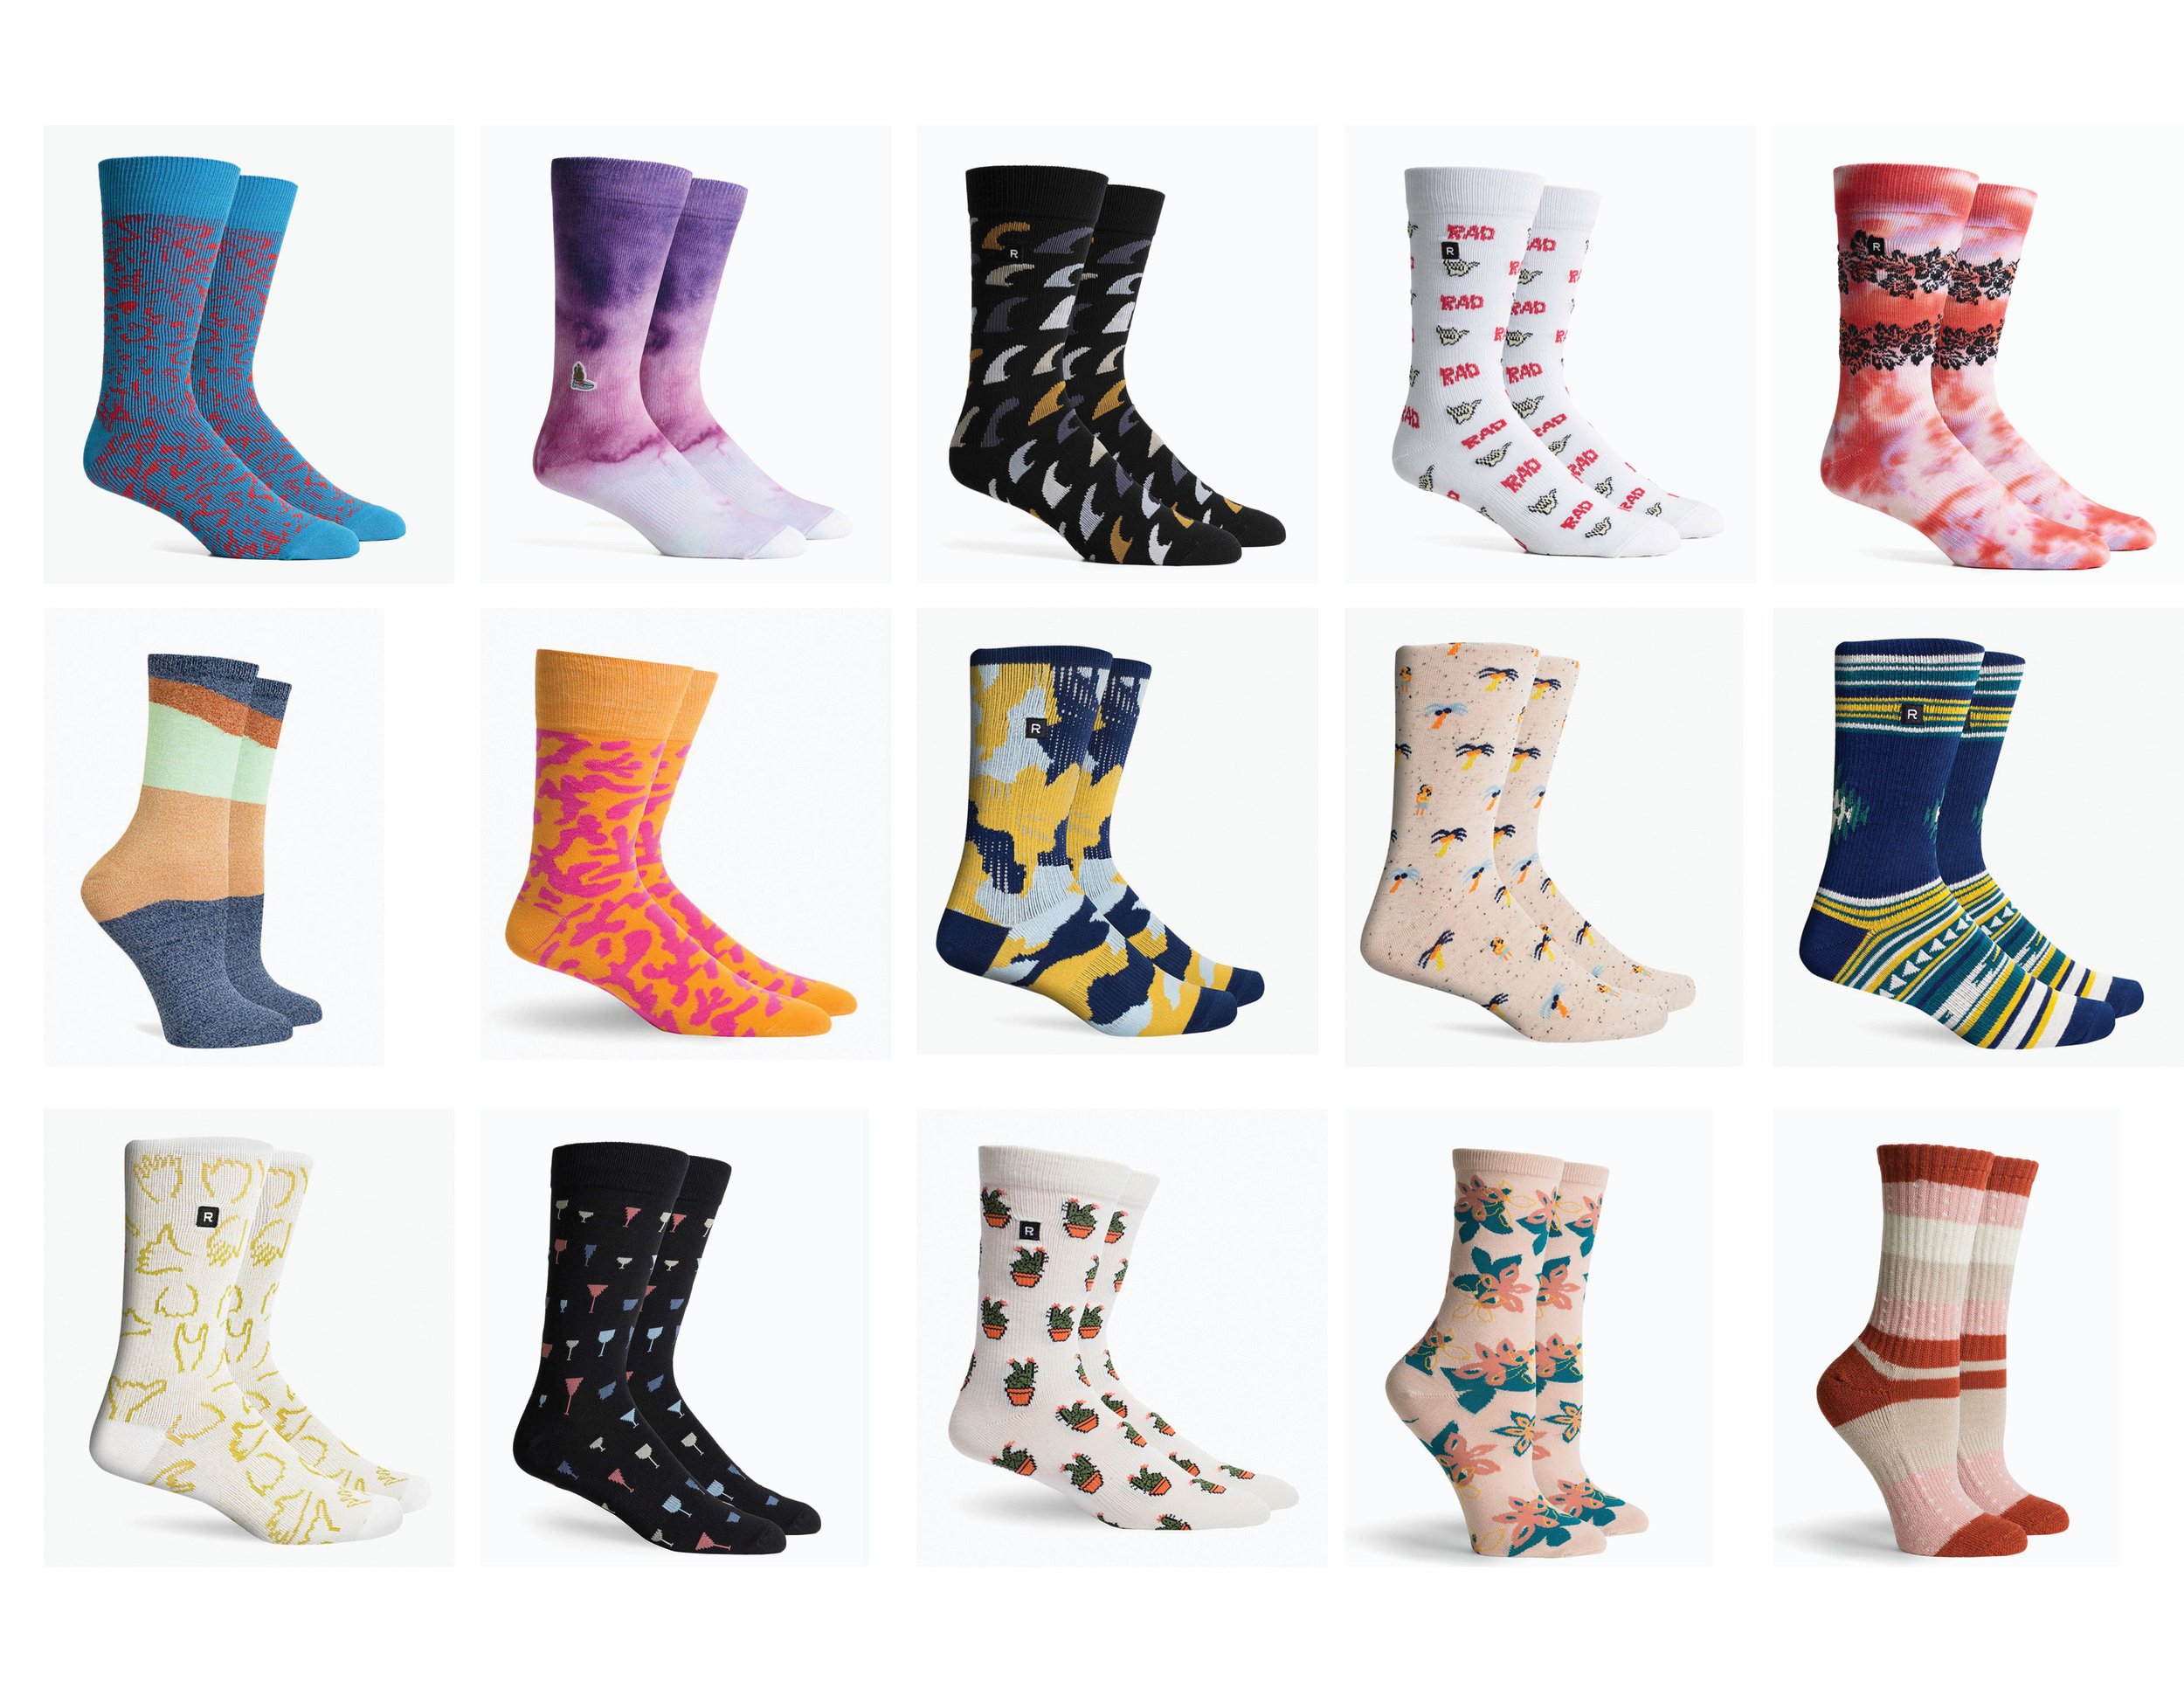 Camelia_Manea_Apparel_Graphics_socks.jpg